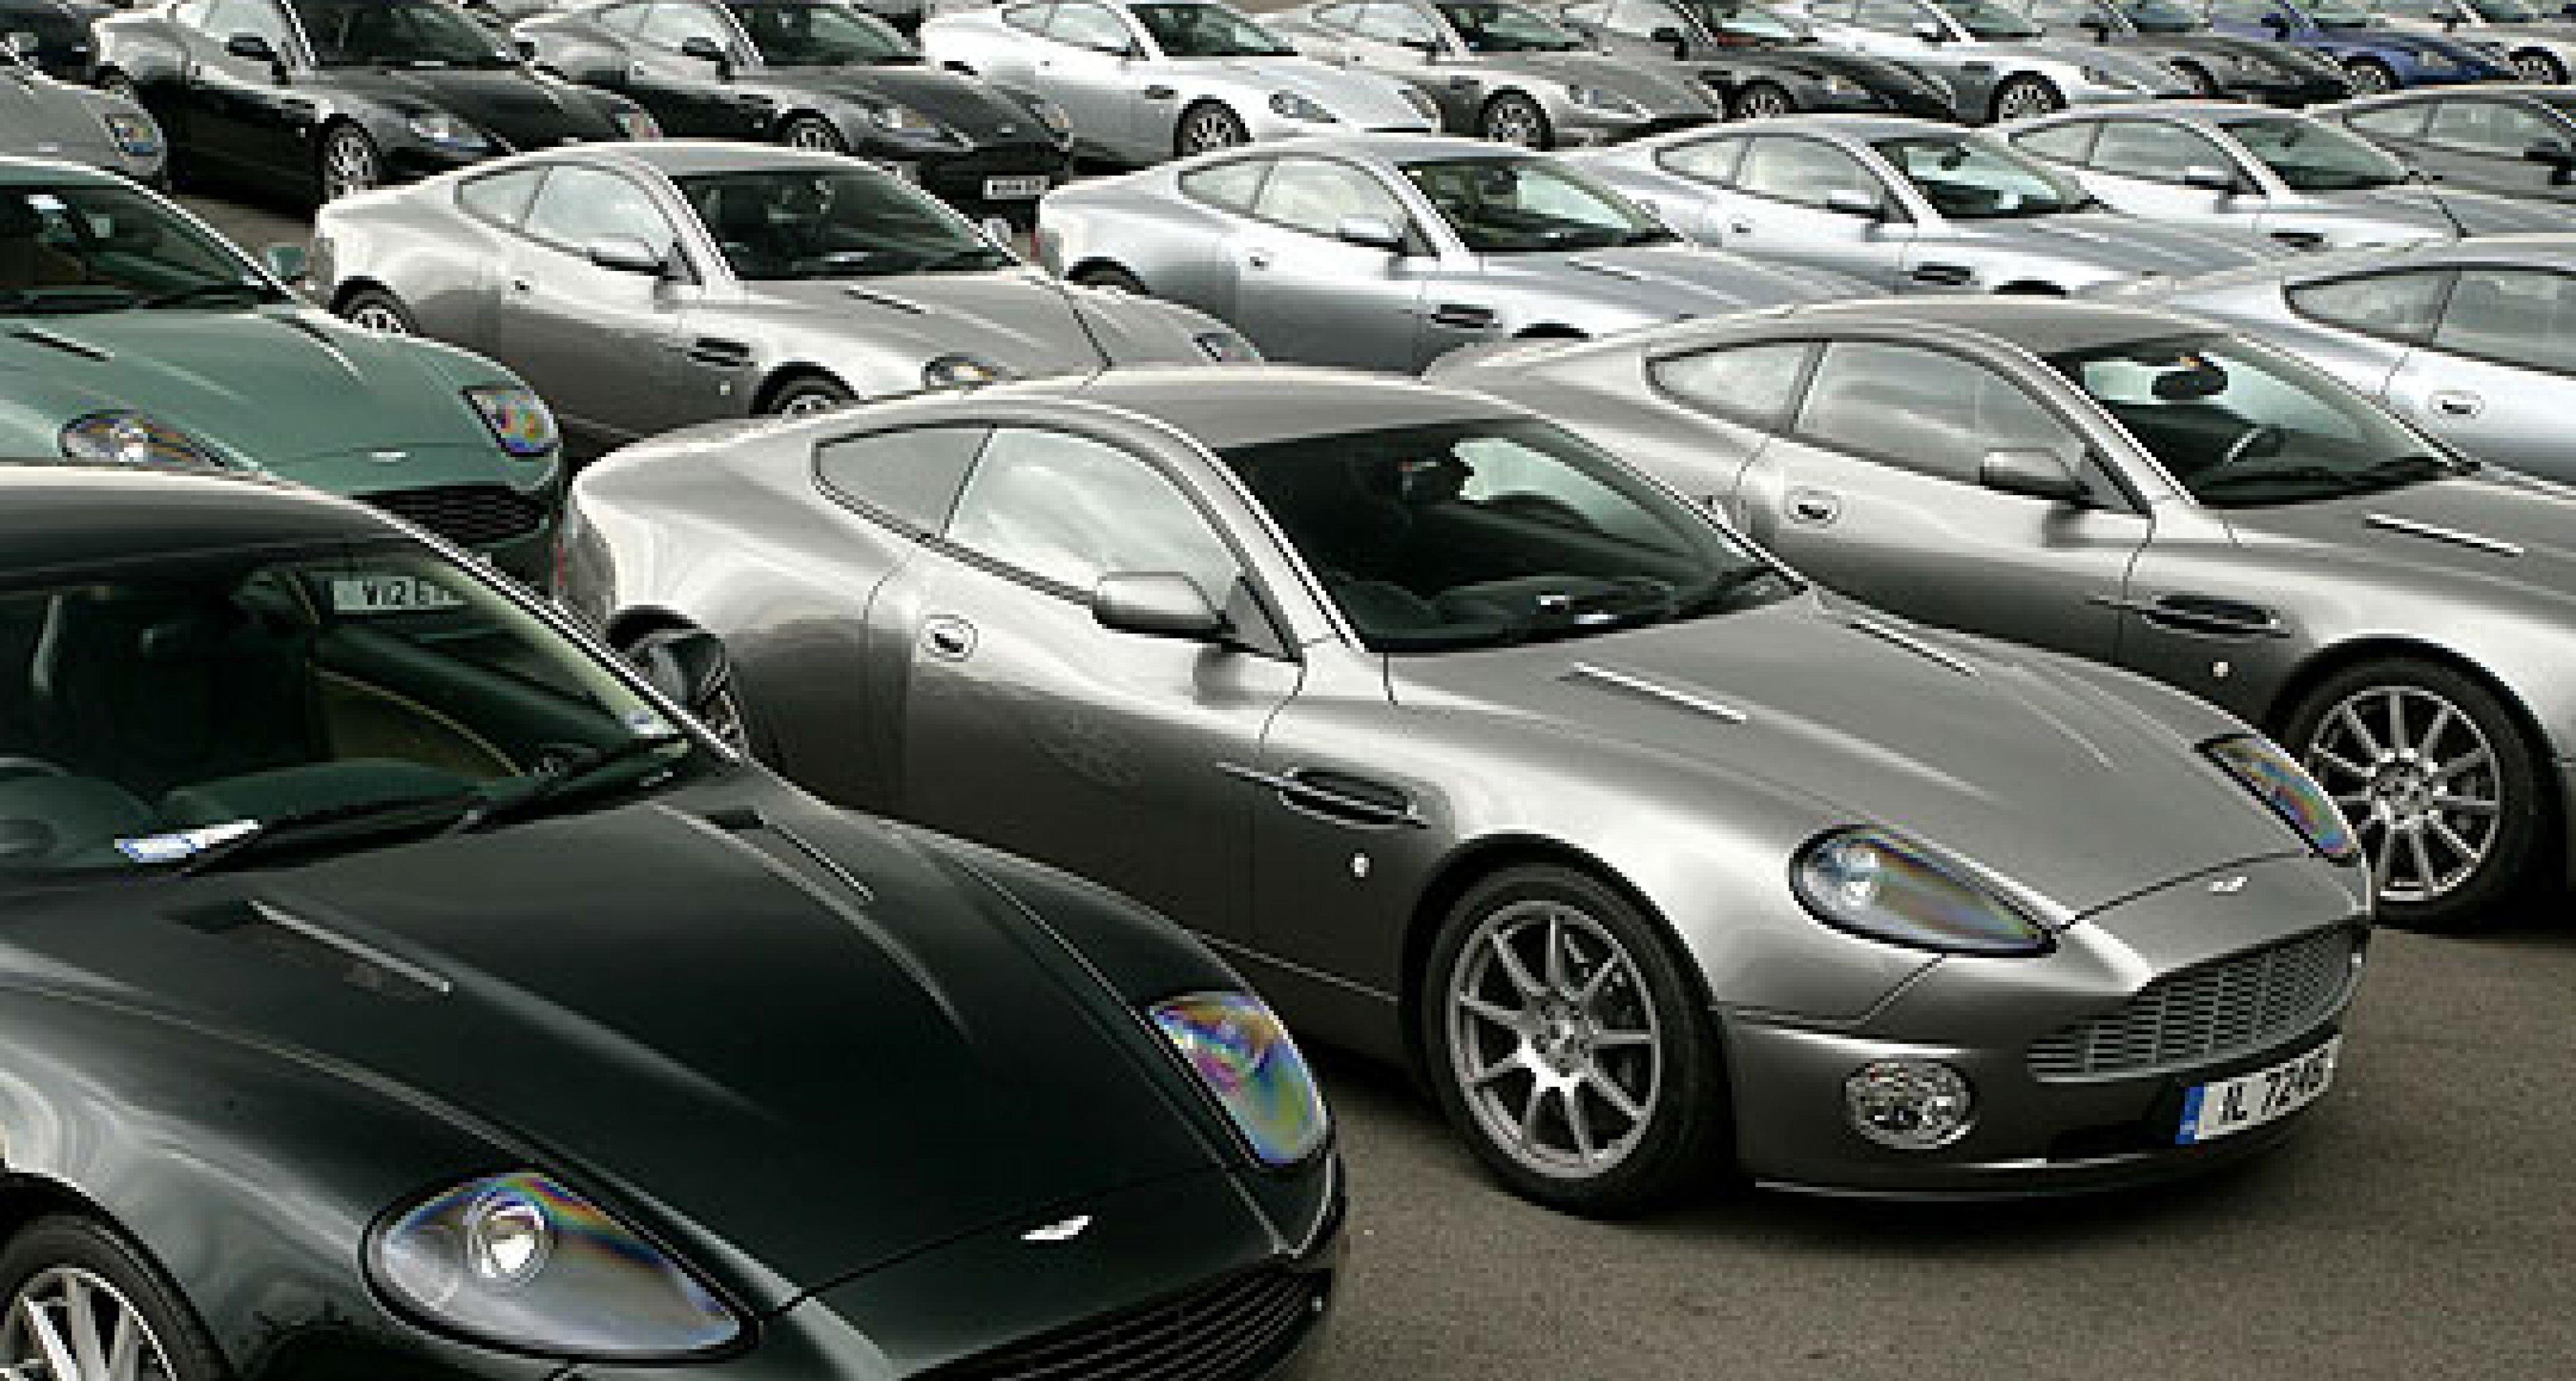 Aston Martin Vanquish Celebration Day 6 May 2007